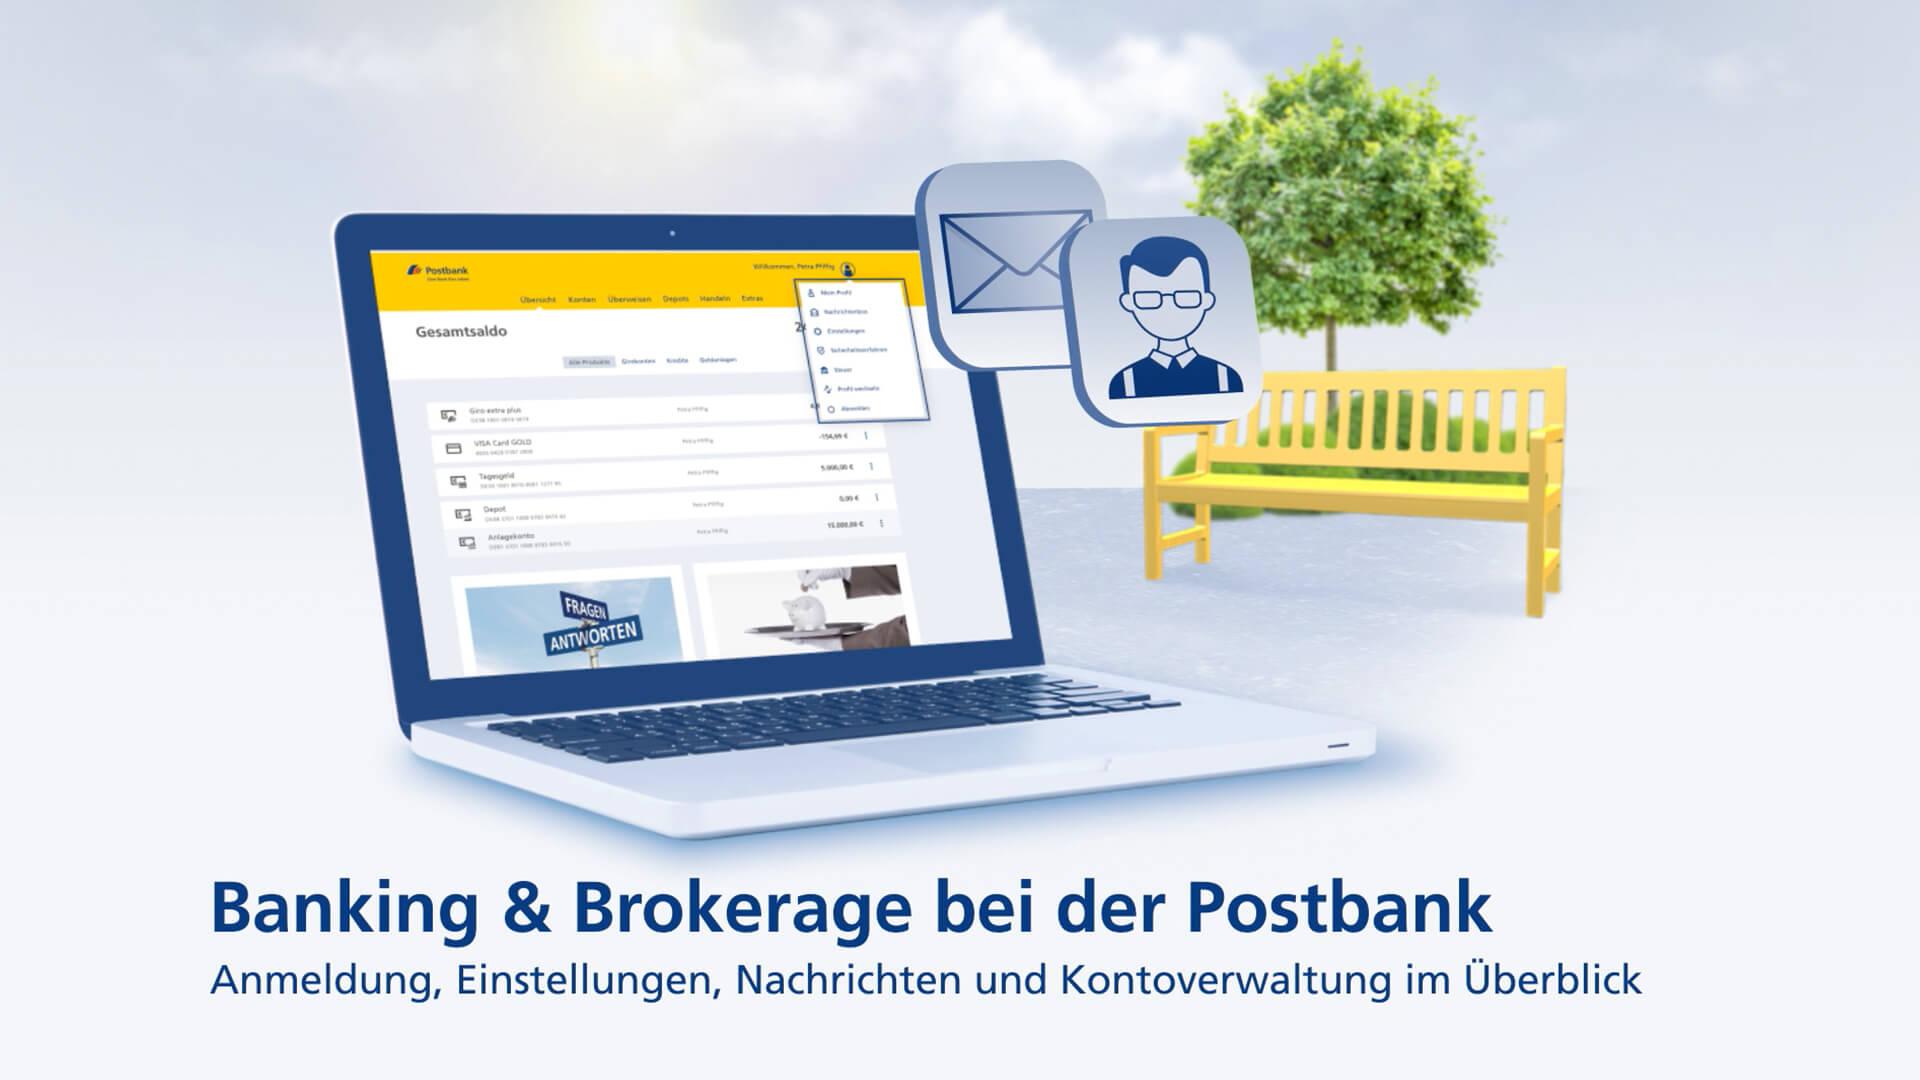 postbank-themenwelten-daten-kontoverwaltung-video-1920x1080.jpg